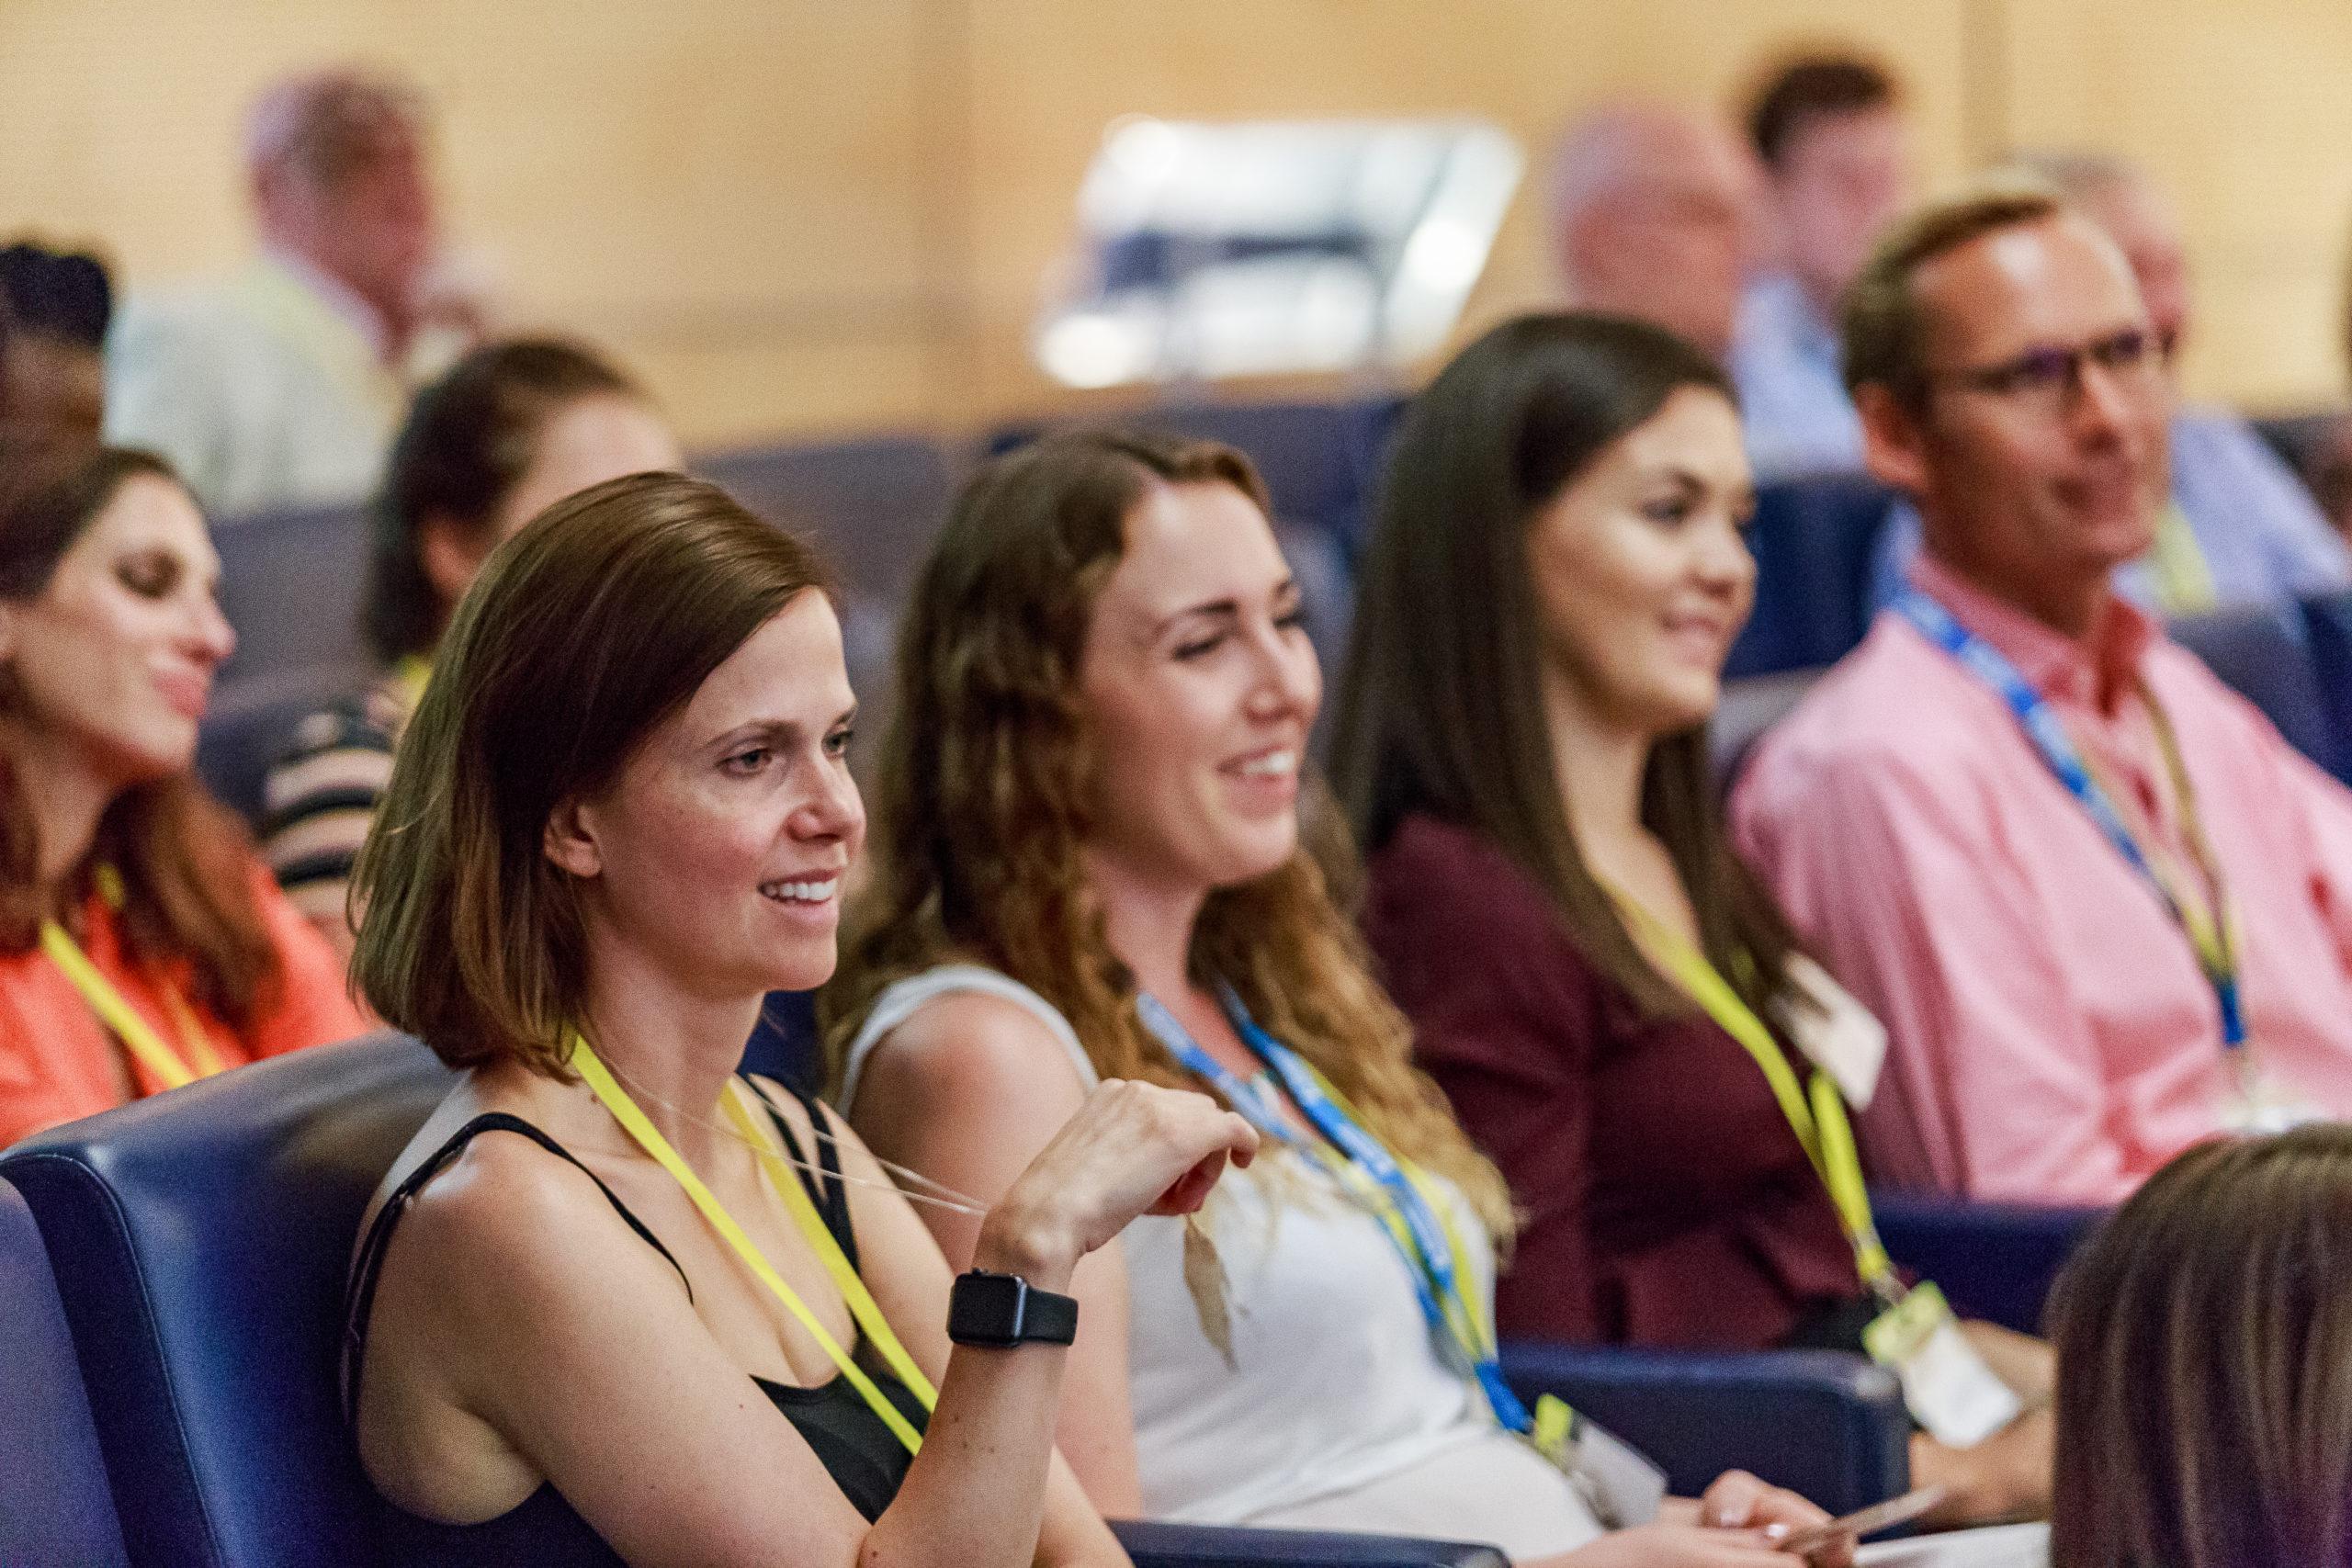 Image of delegates at conference